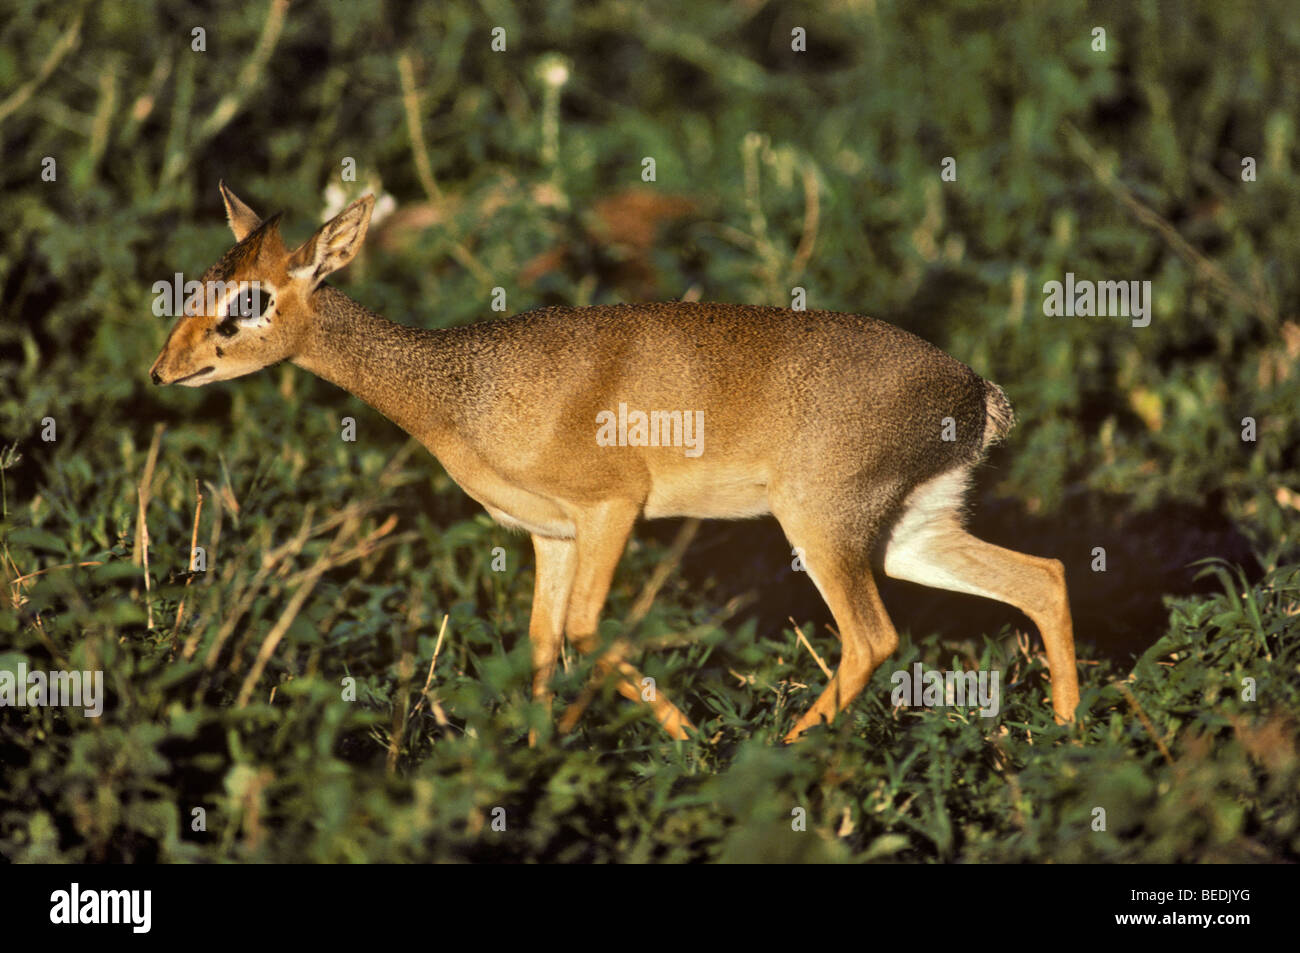 Dik-dik (small antelope) at Lake Manyara National Park,Tanzania. - Stock Image